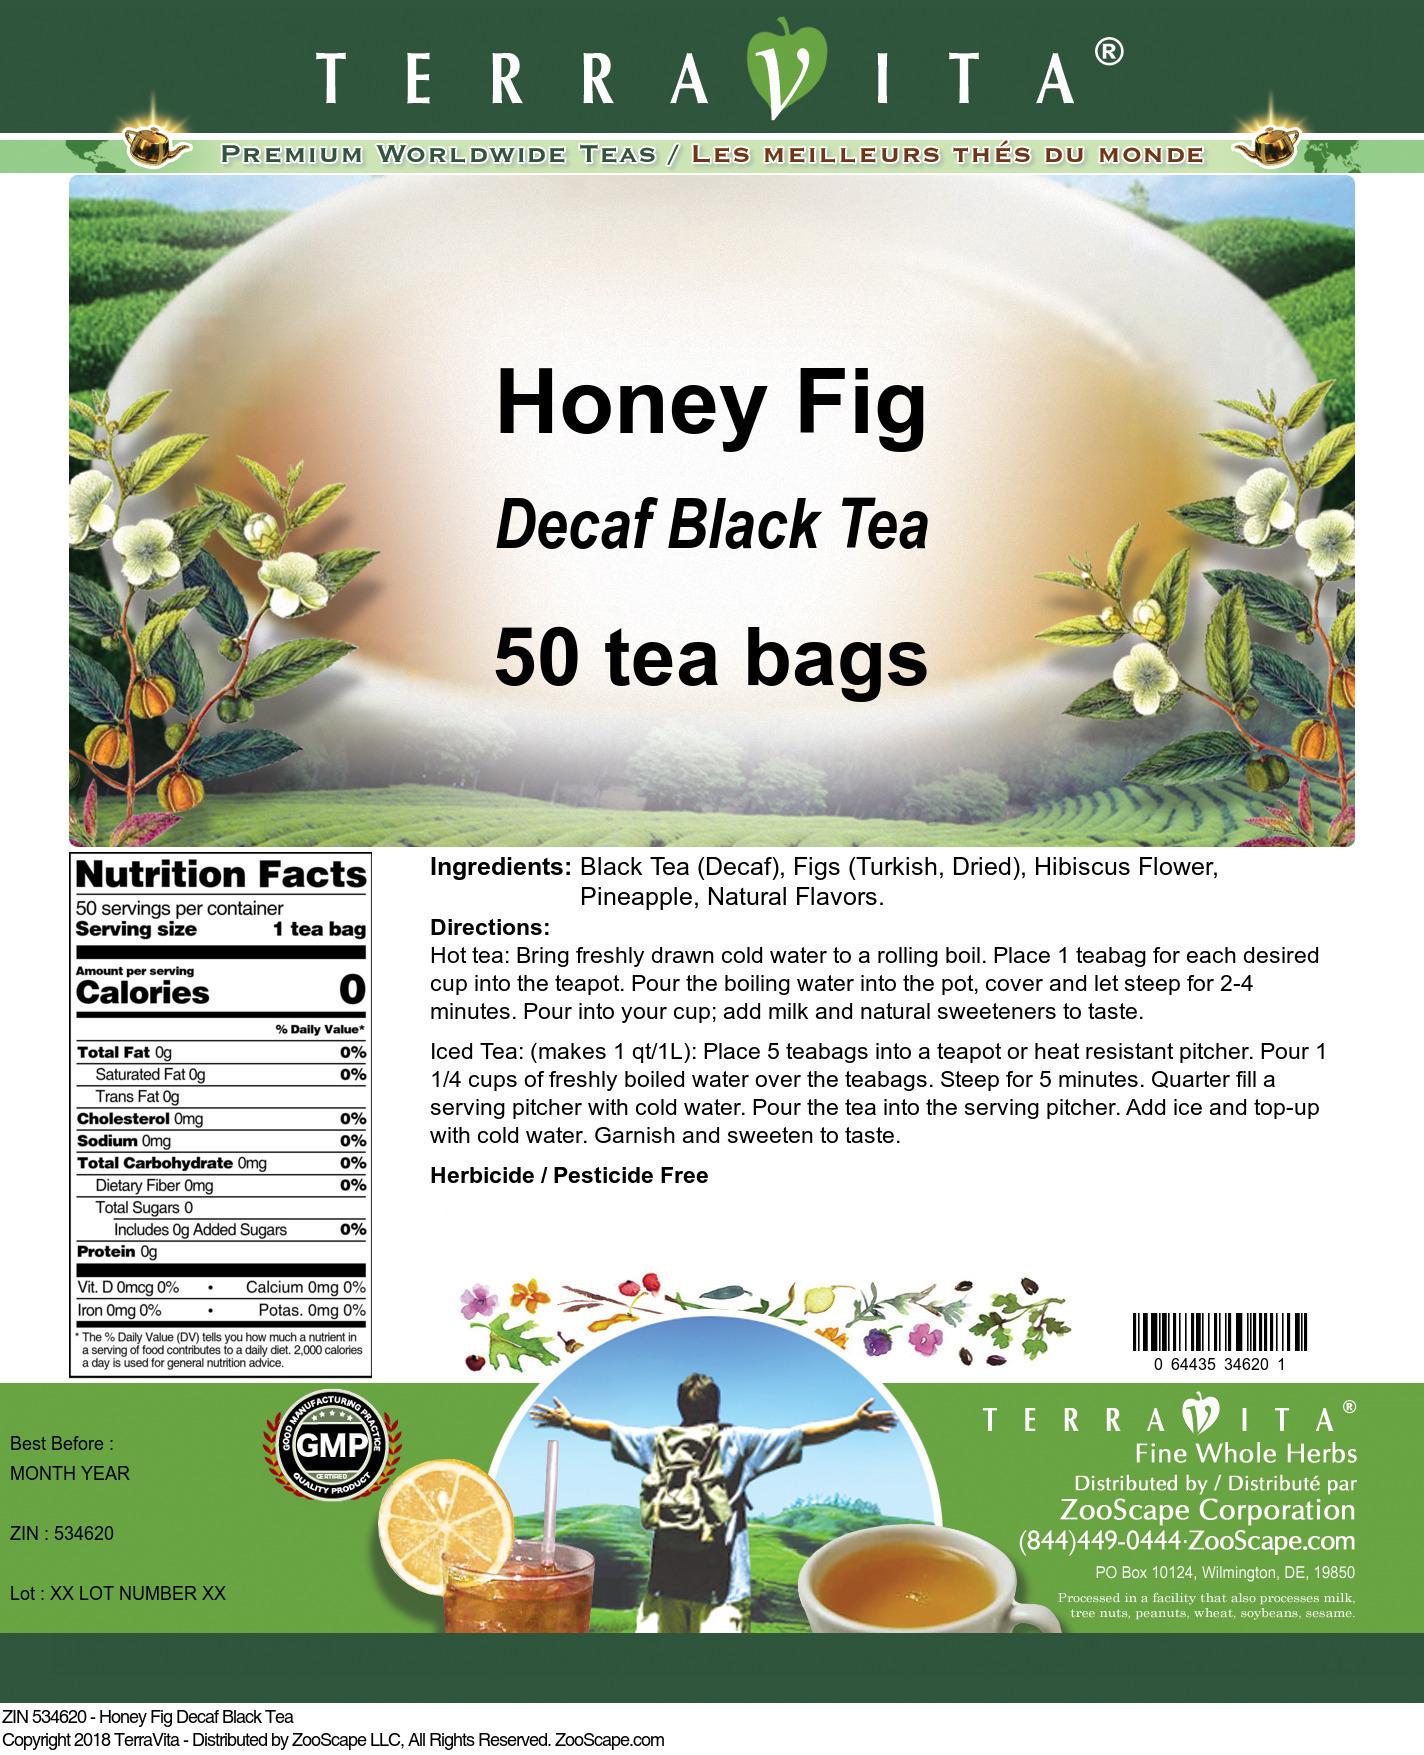 Honey Fig Decaf Black Tea